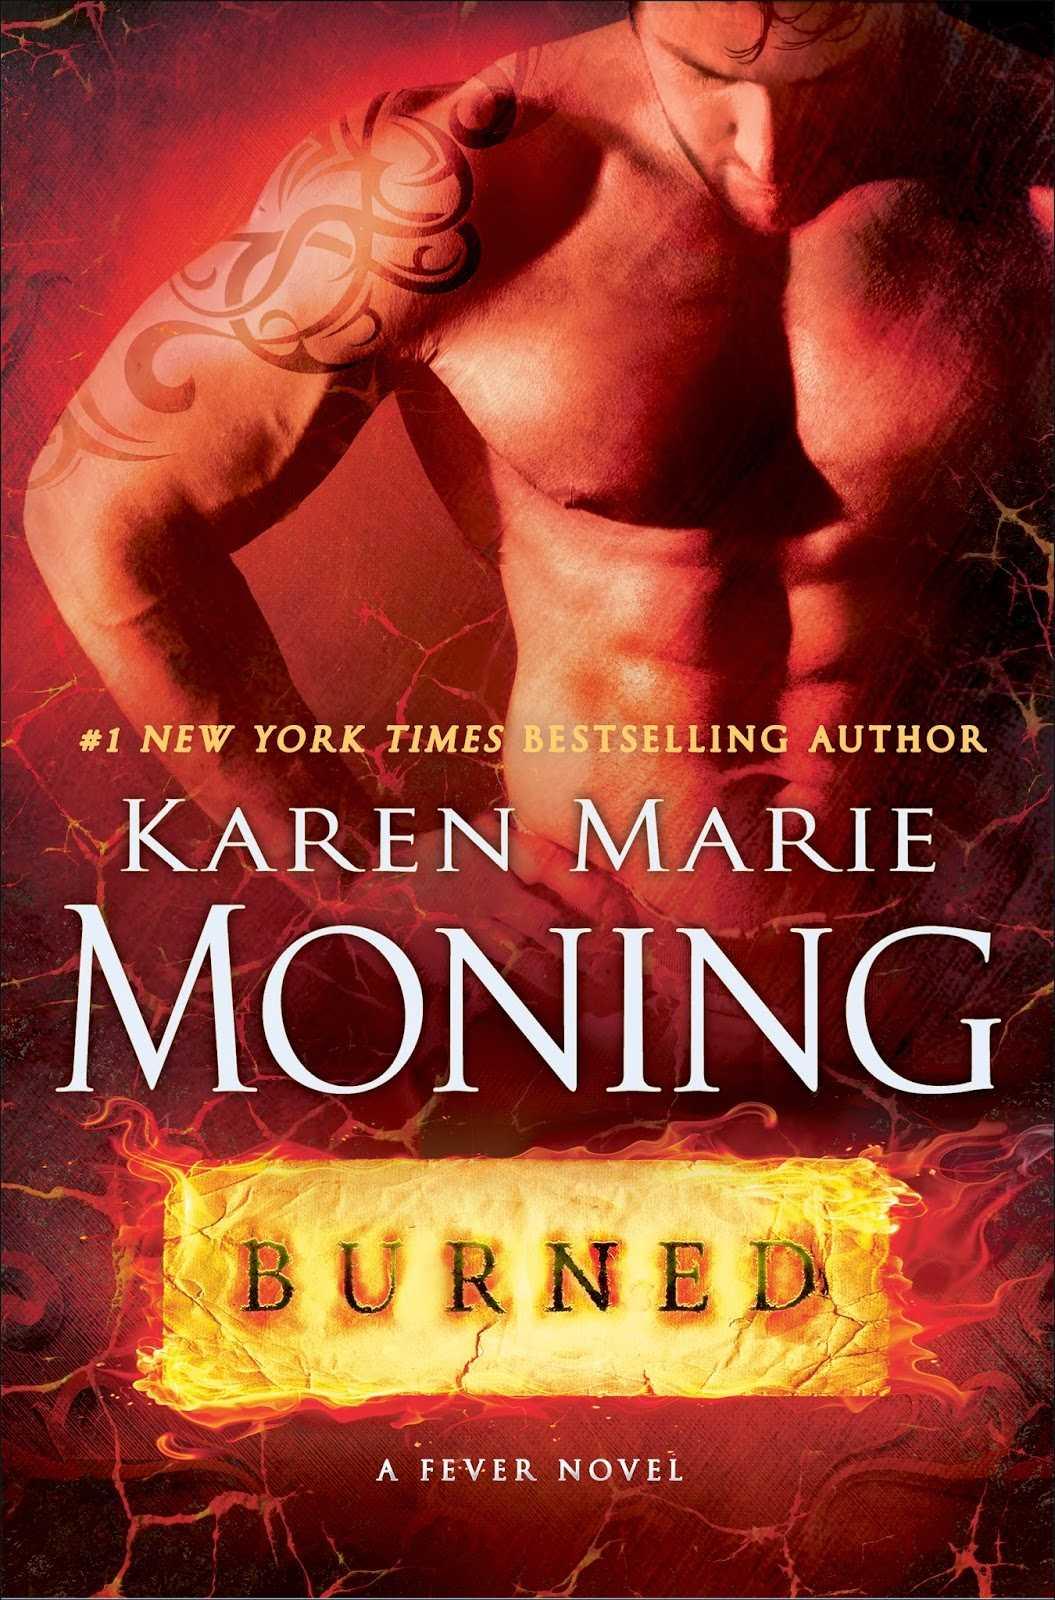 Karen Marie Moning Delivers Sensual, Action-Packed Fantasies In BURNED | BURNED